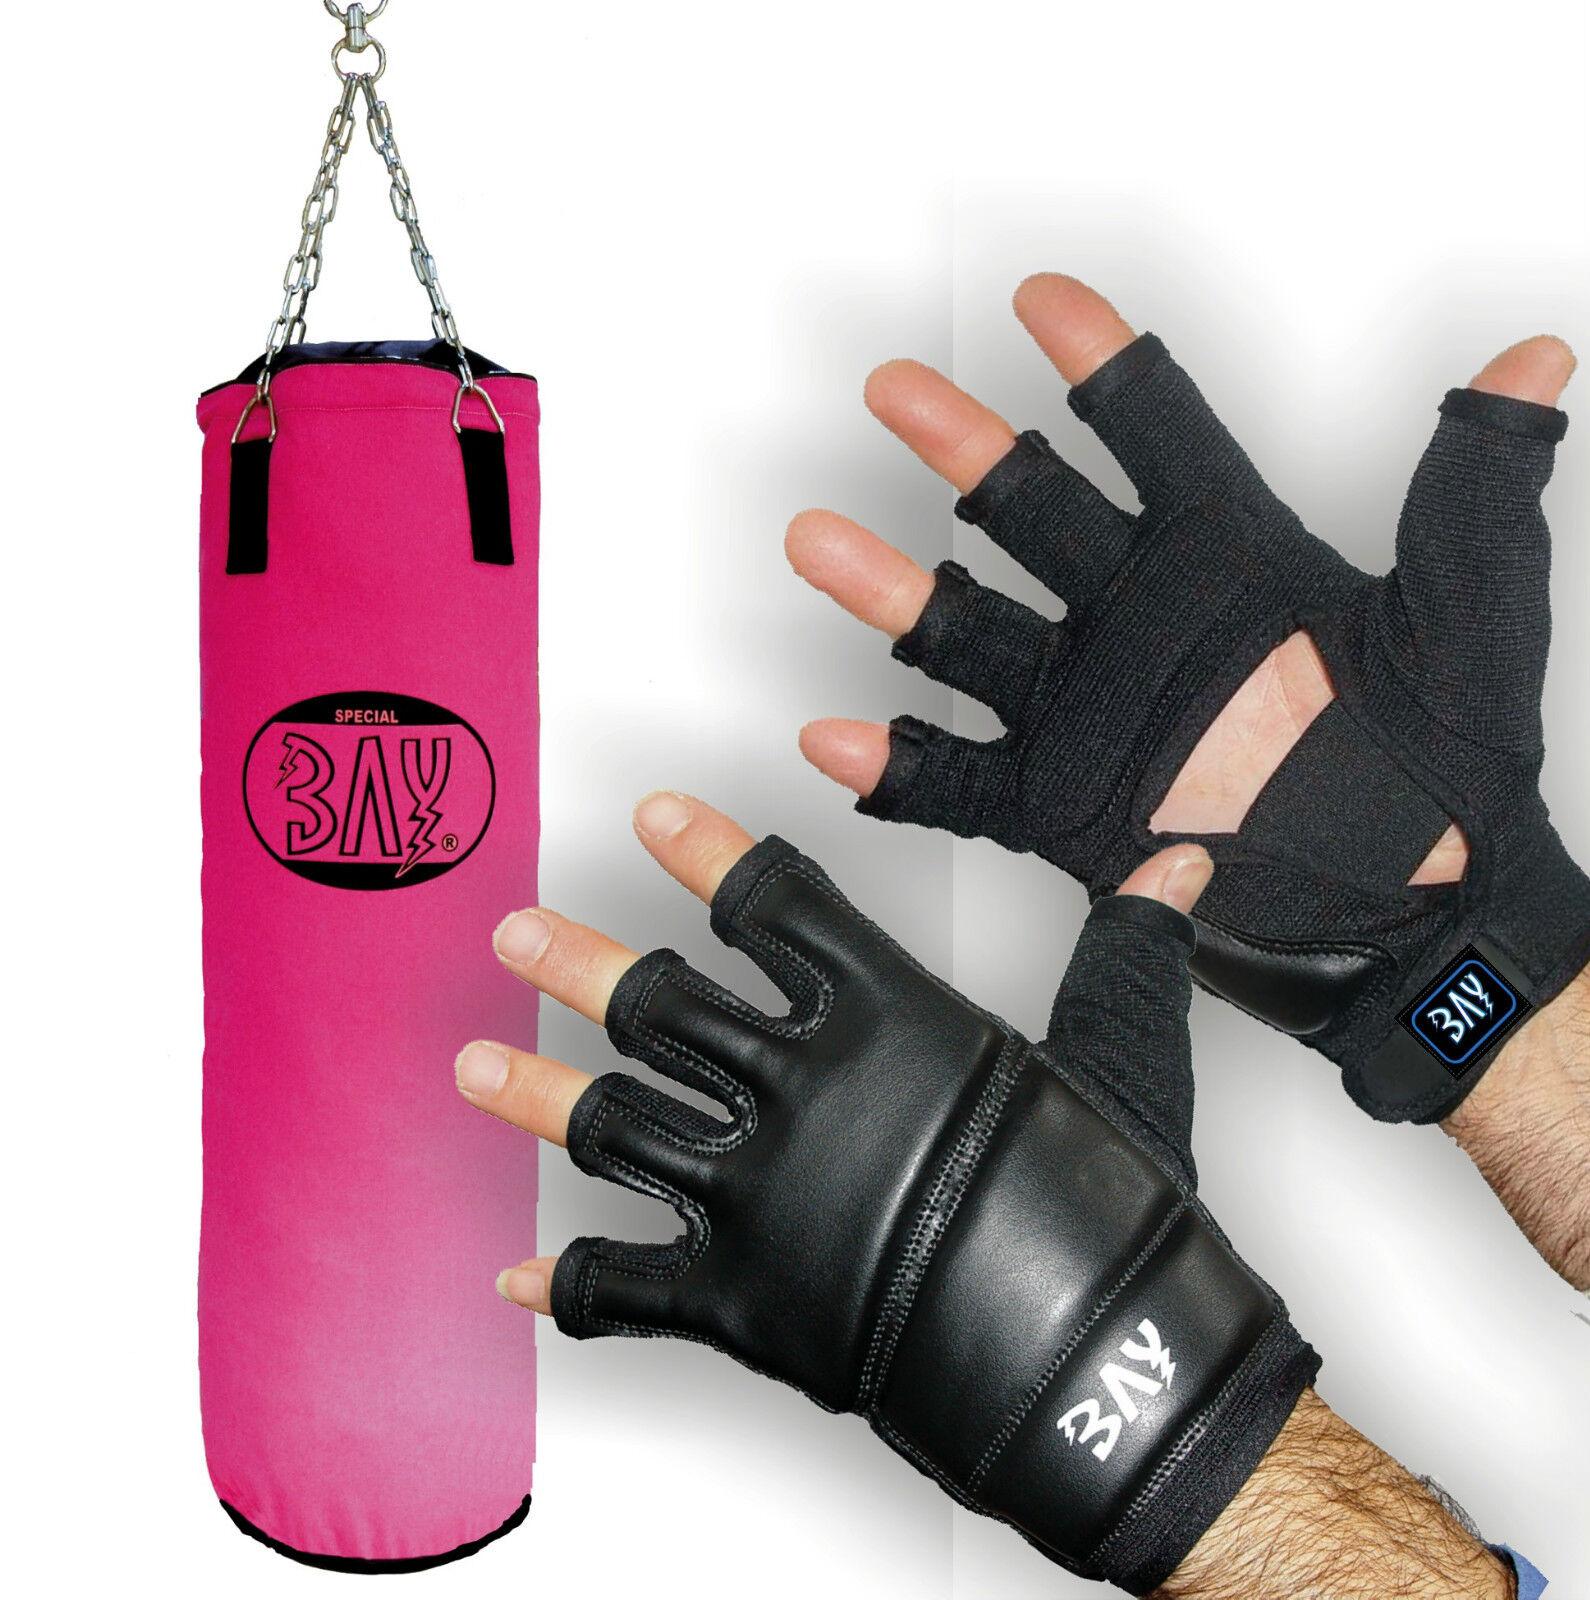 BAY® Profi Box-Set Boxsack Sandsack Punching Punching Punching Bag Boxhandschuhe 130 cm Rosa Rosa 5f45fa